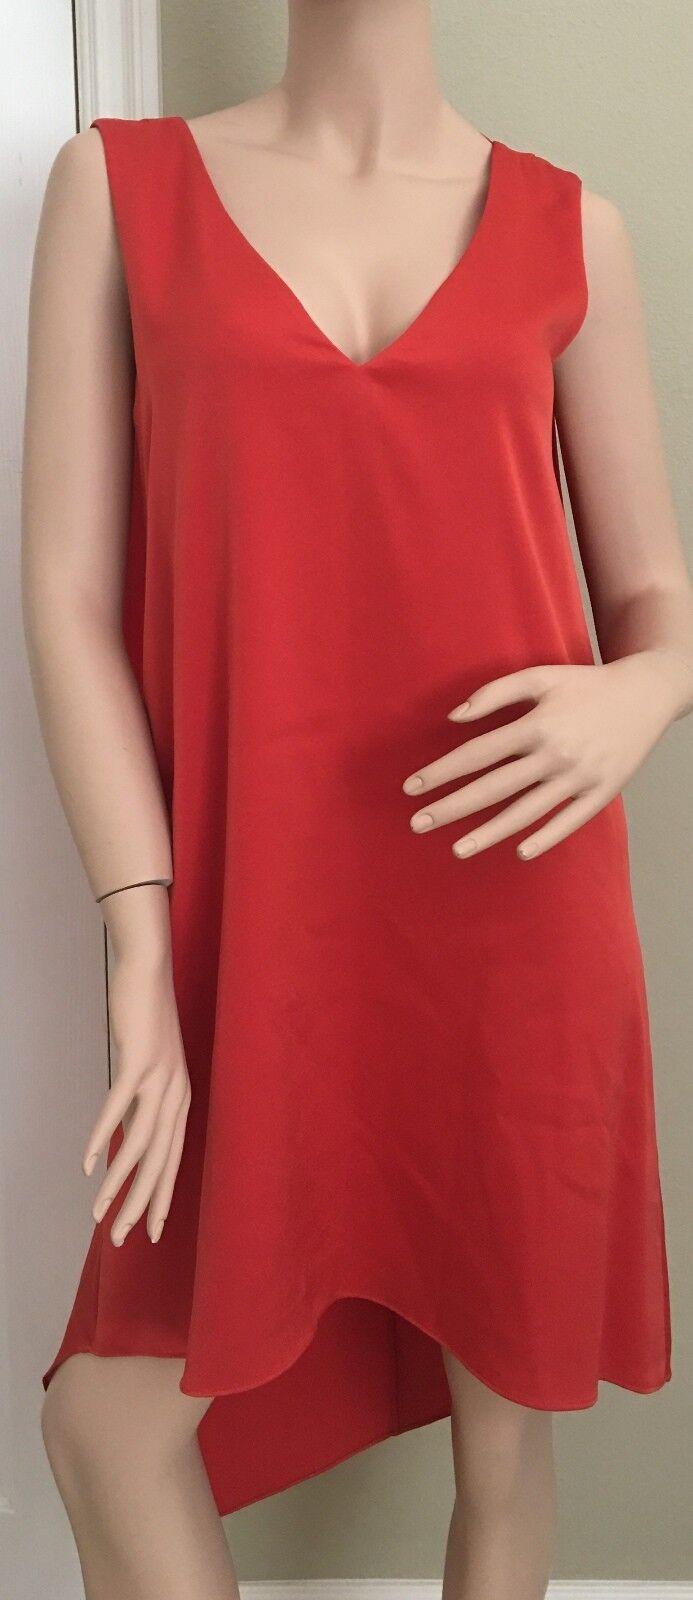 BCBGMax Azria Women's Shana Woven Cascade Dress Dress Dress size  X-Small  msrp  228 12fa8f